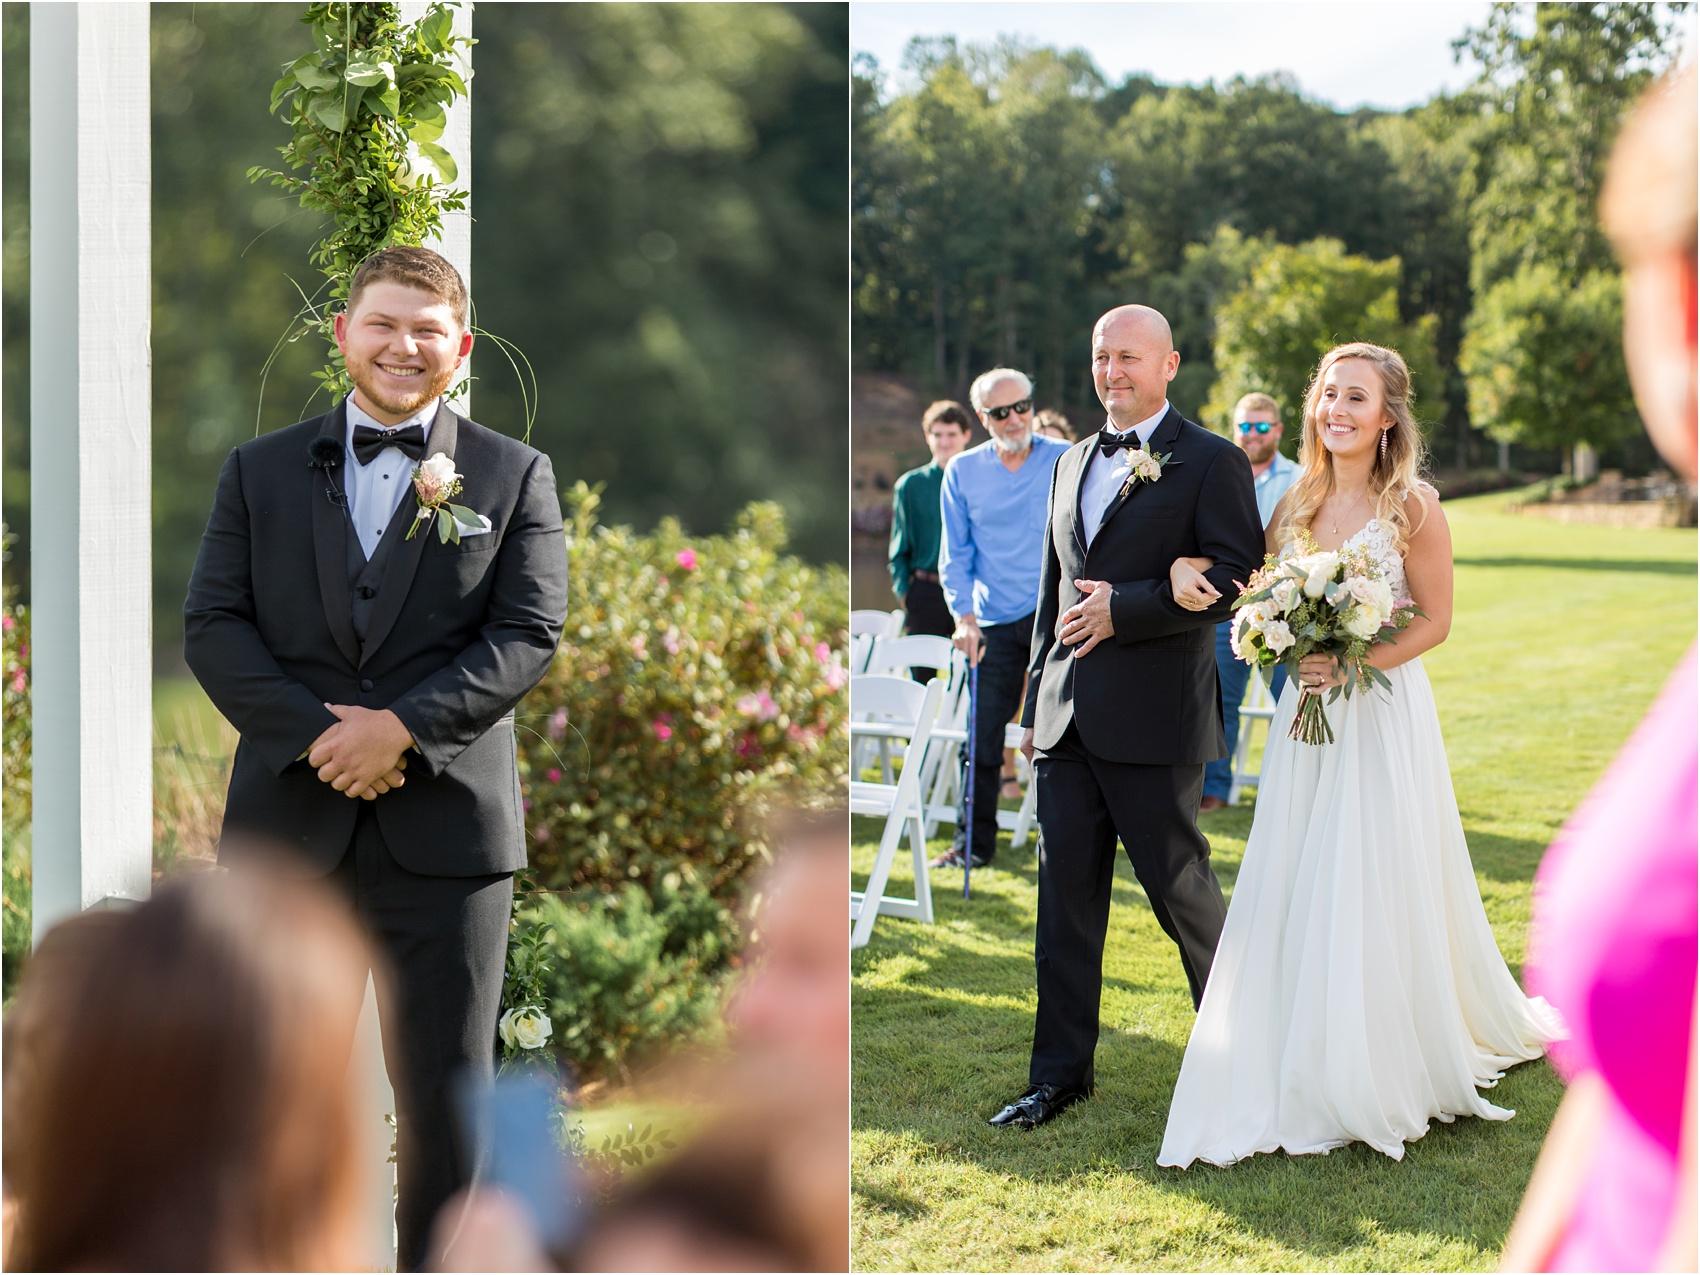 Savannah Eve Photography- Jurek-Woodworth Wedding- Sneak Peek-34.jpg